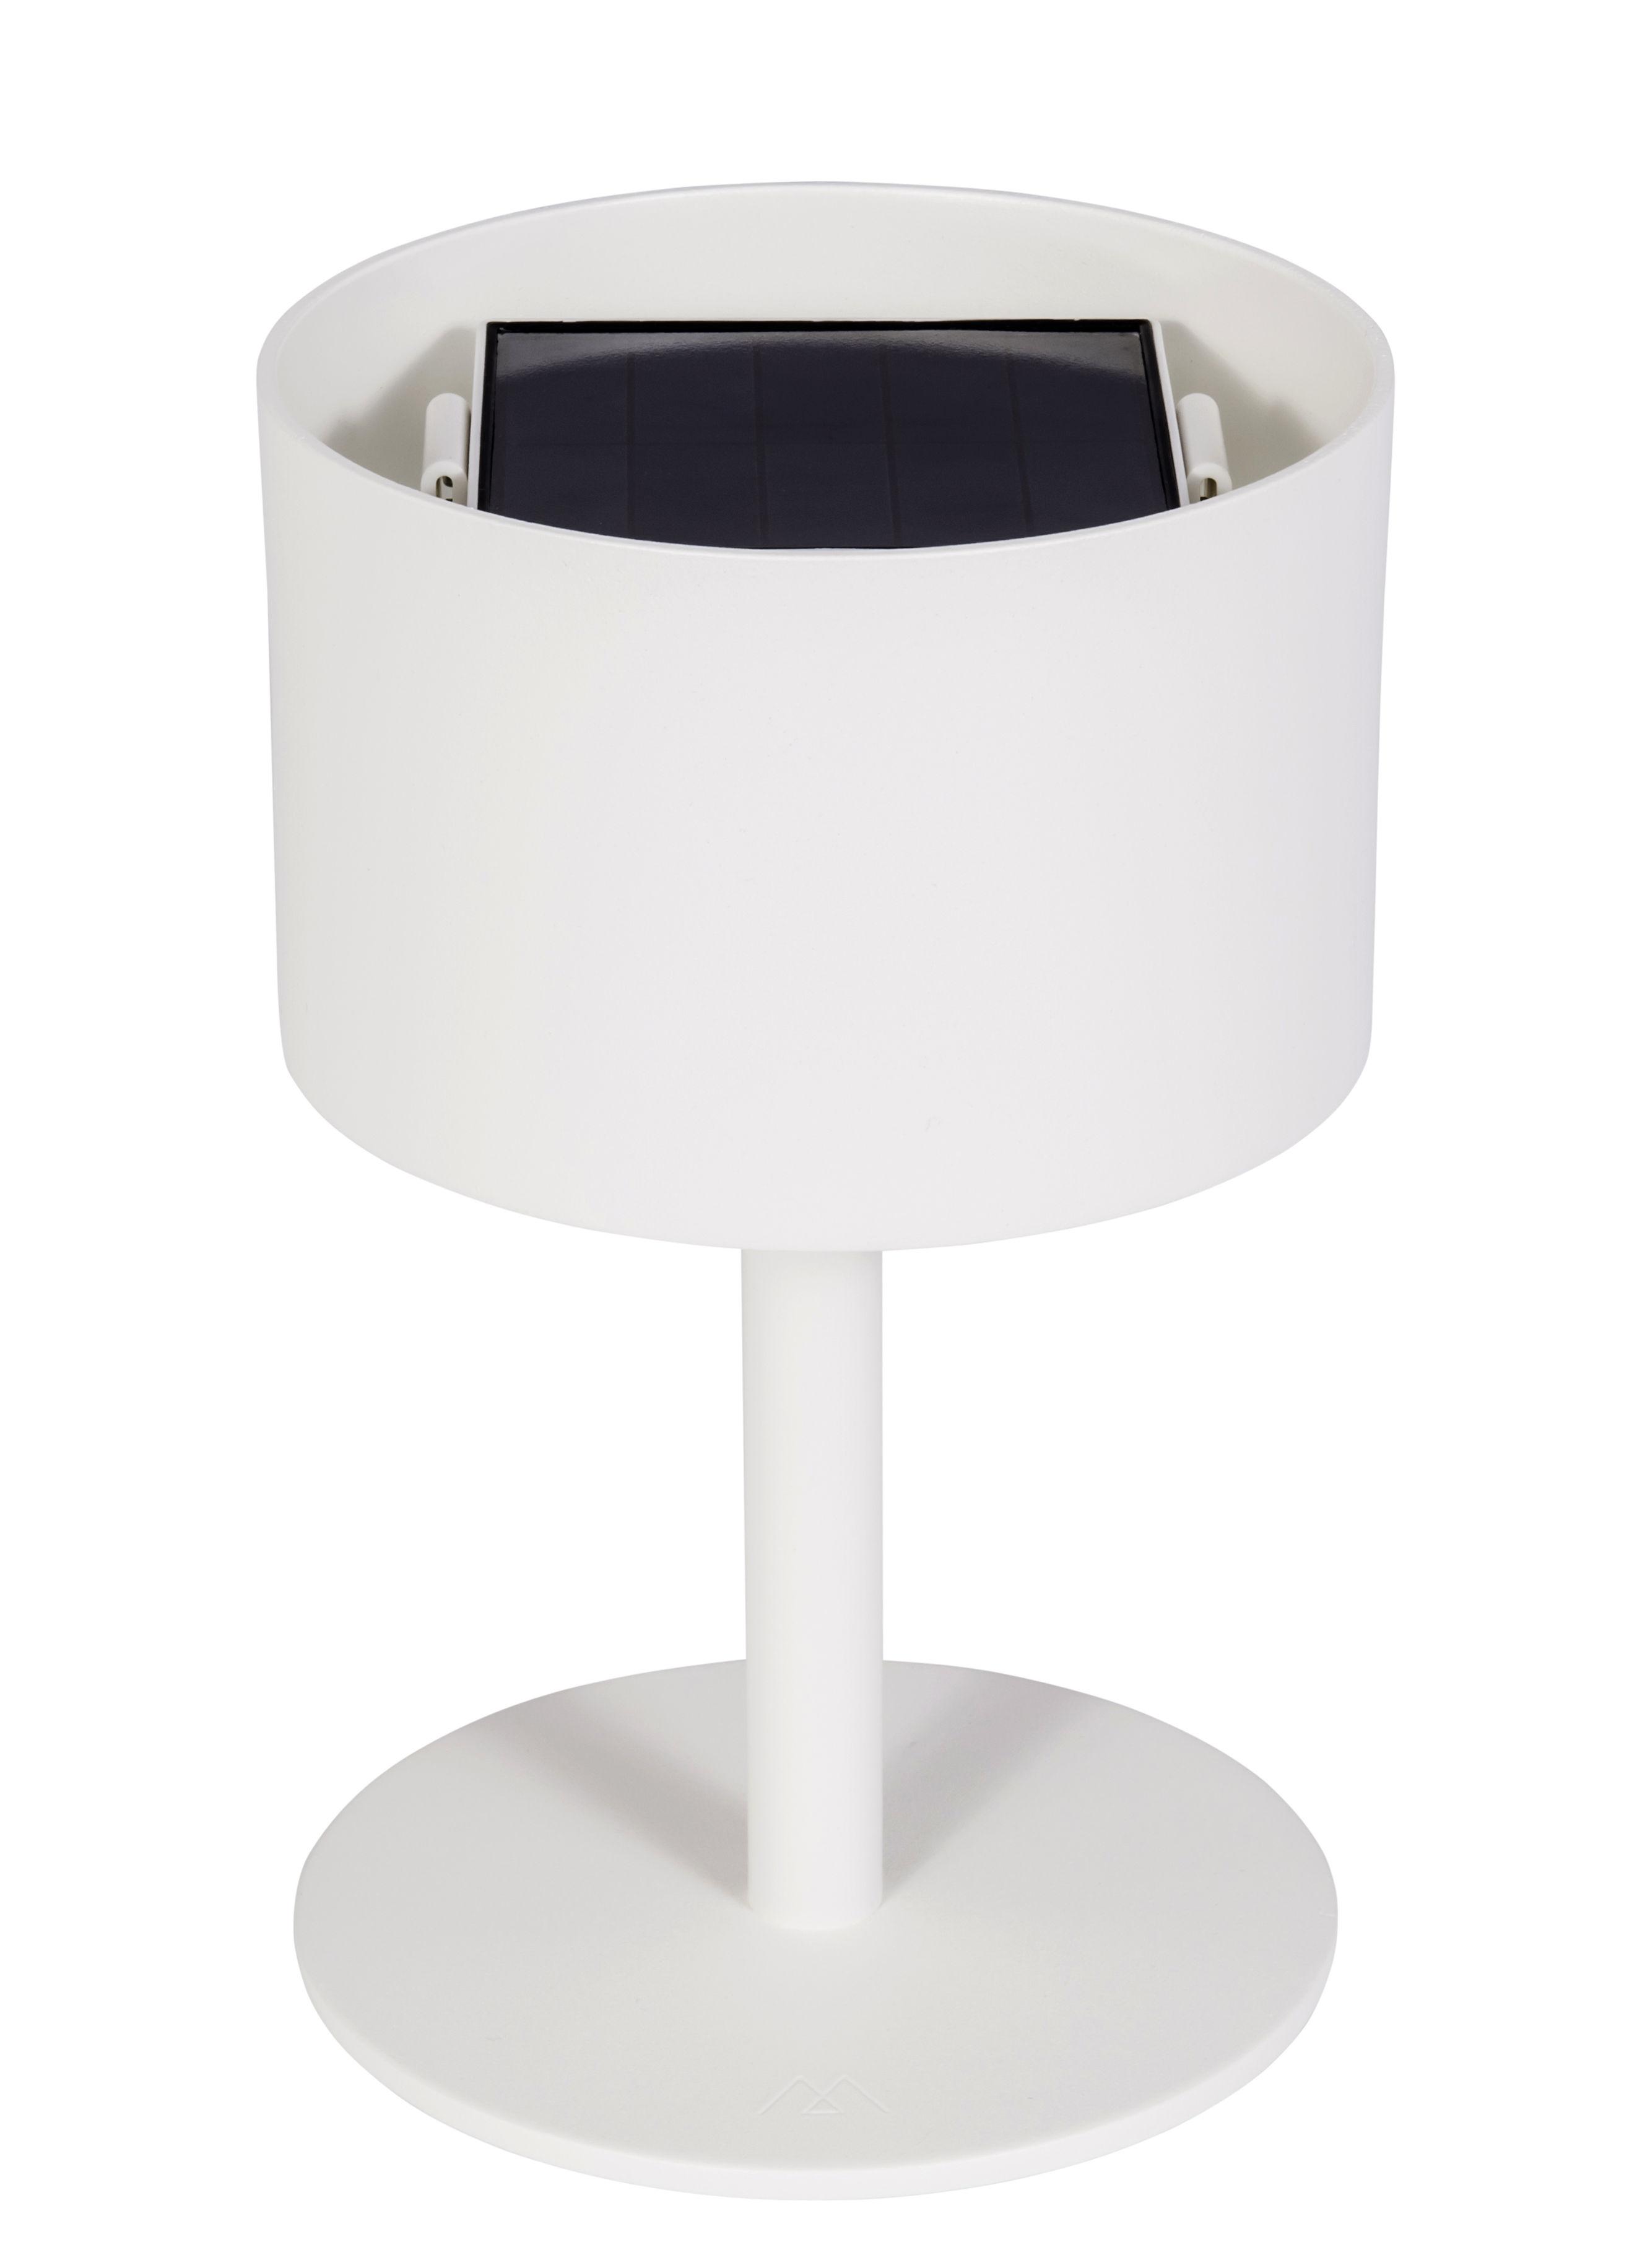 lampe solaire la lampe pose 01 led sans fil blanc maiori made in design. Black Bedroom Furniture Sets. Home Design Ideas